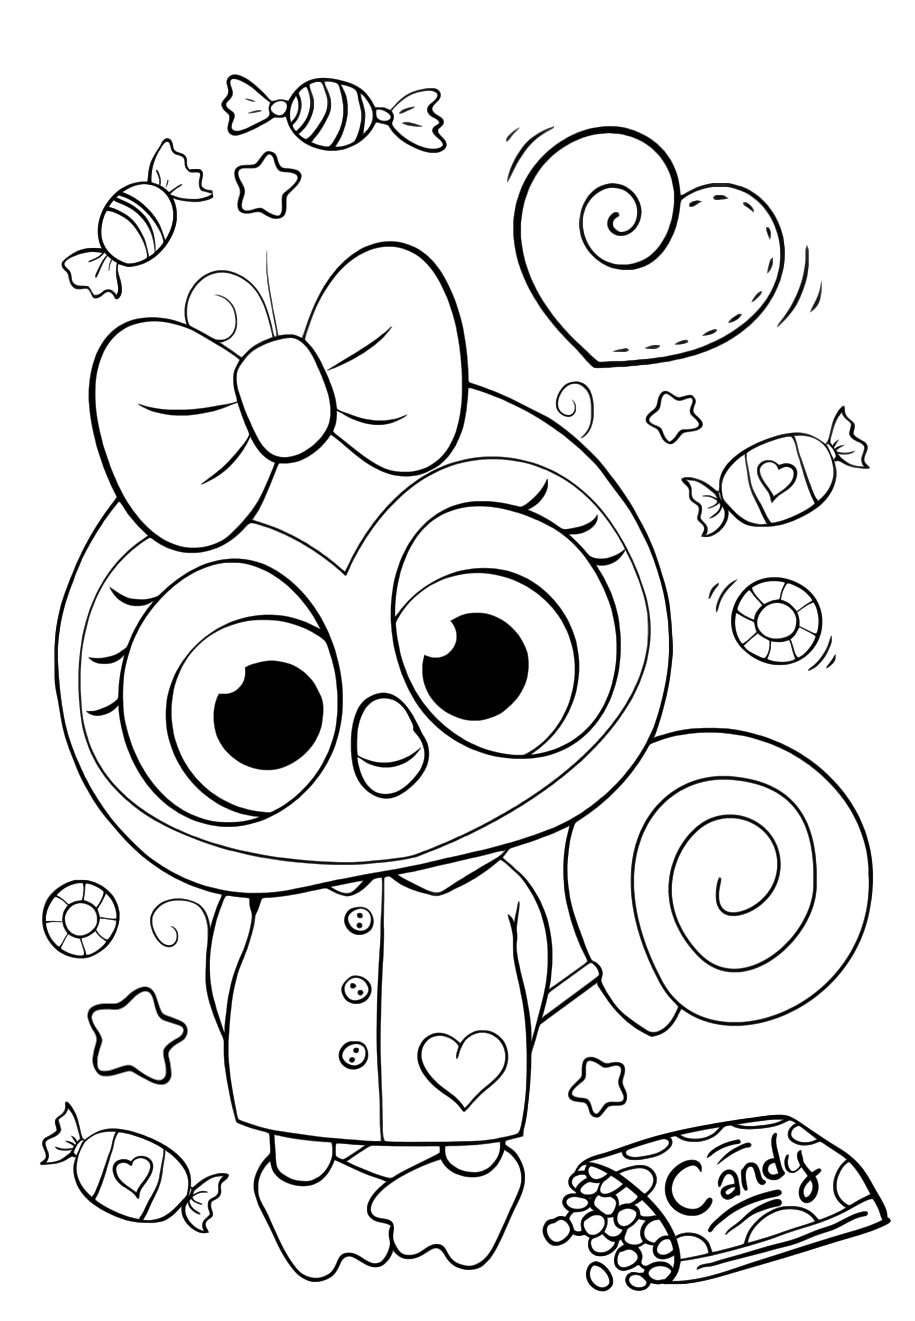 Совушка с конфетами - Милашки - Раскраски антистресс